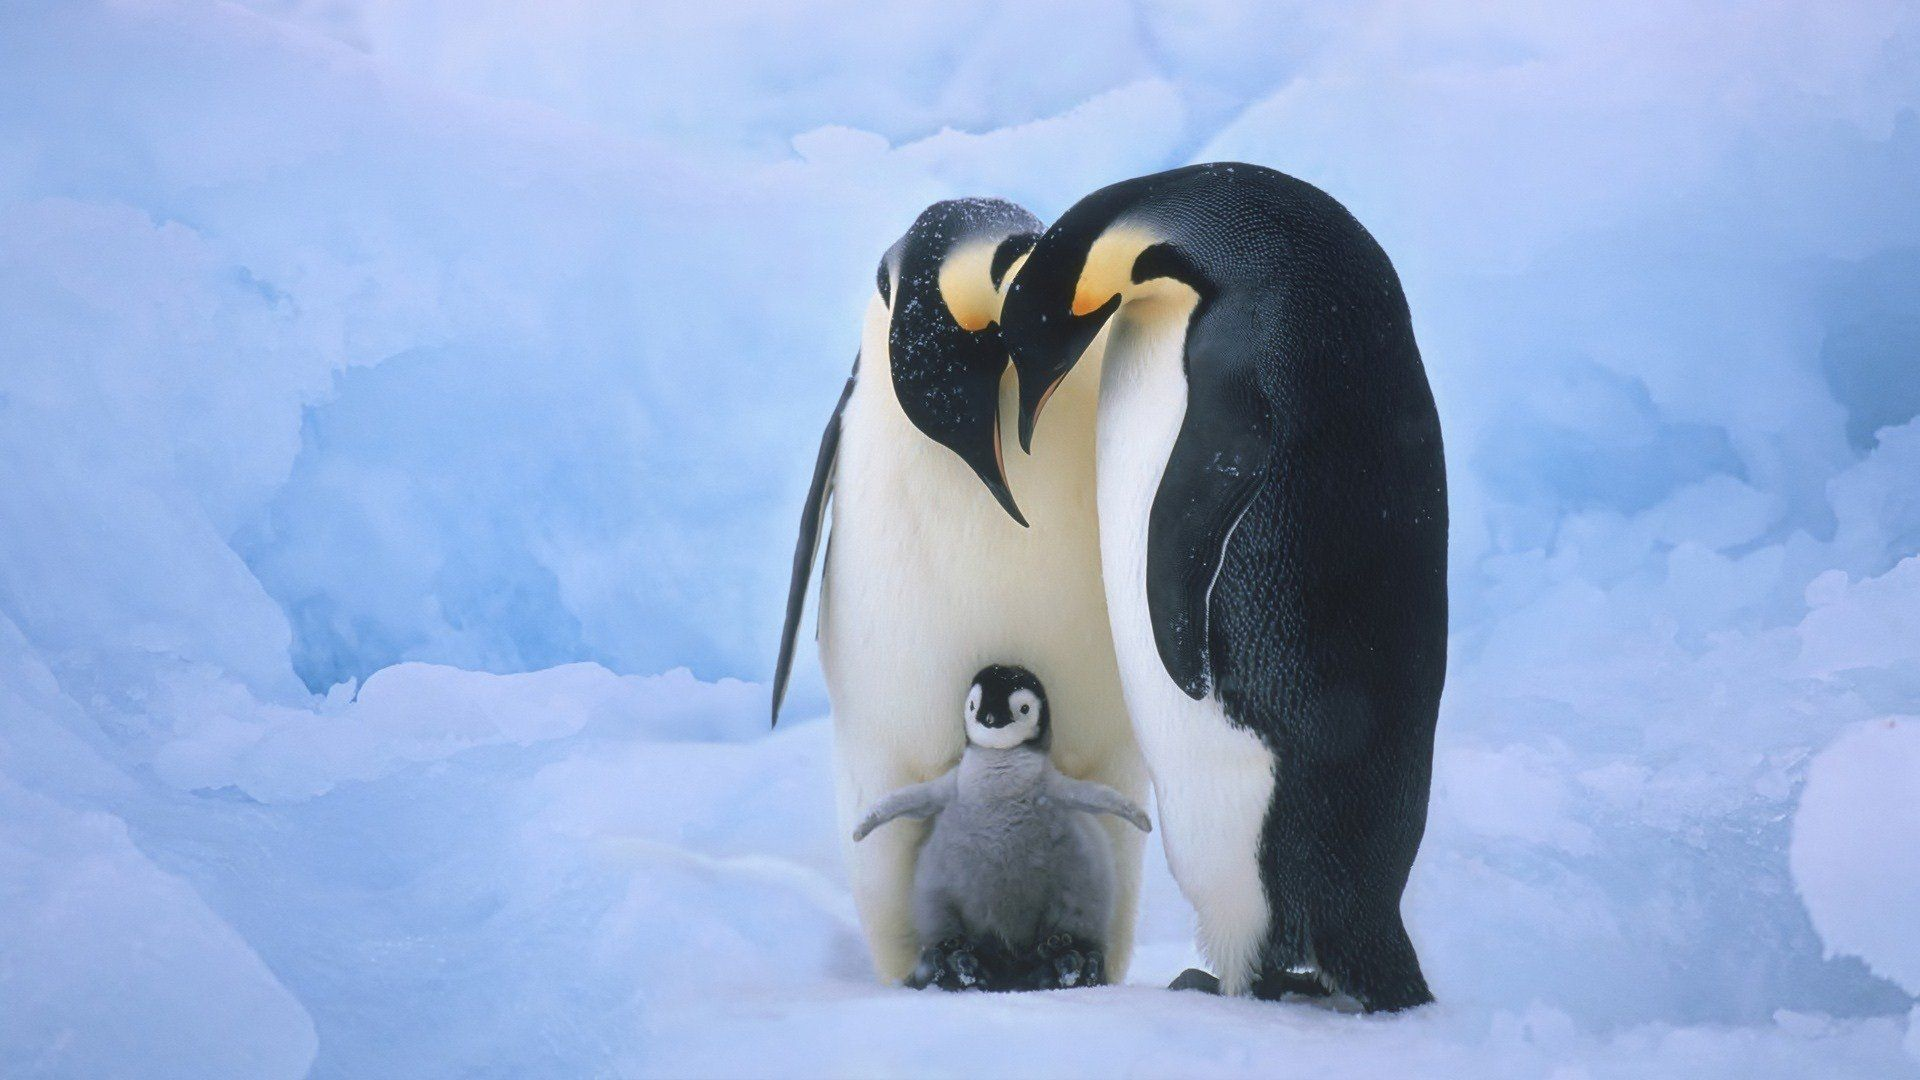 penguin wallpaper hd